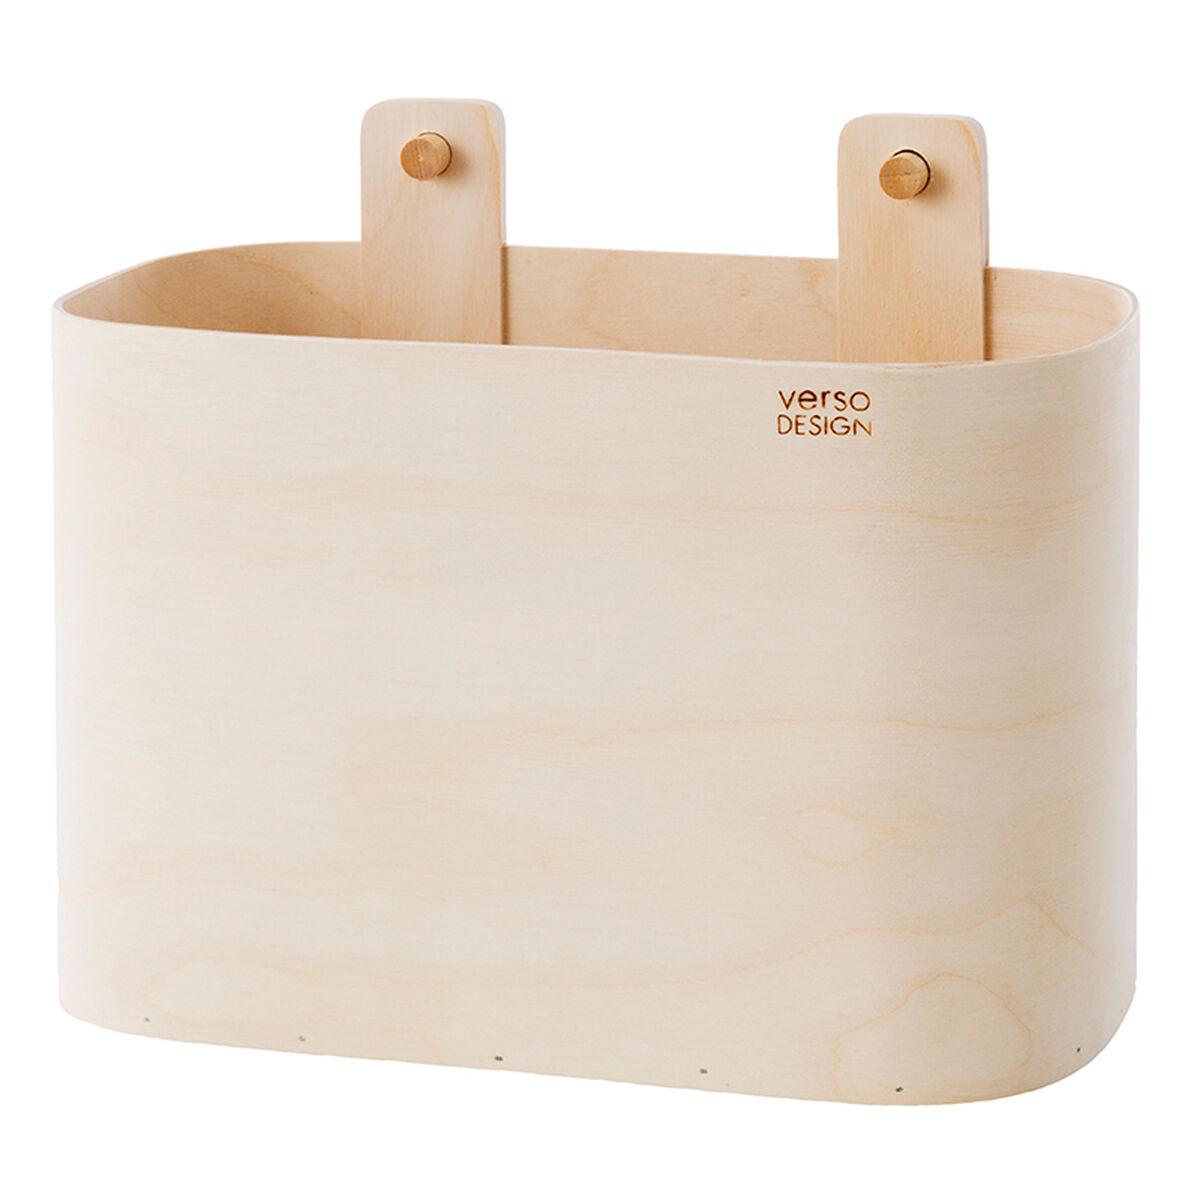 Verso Design Koppa Wall Basket